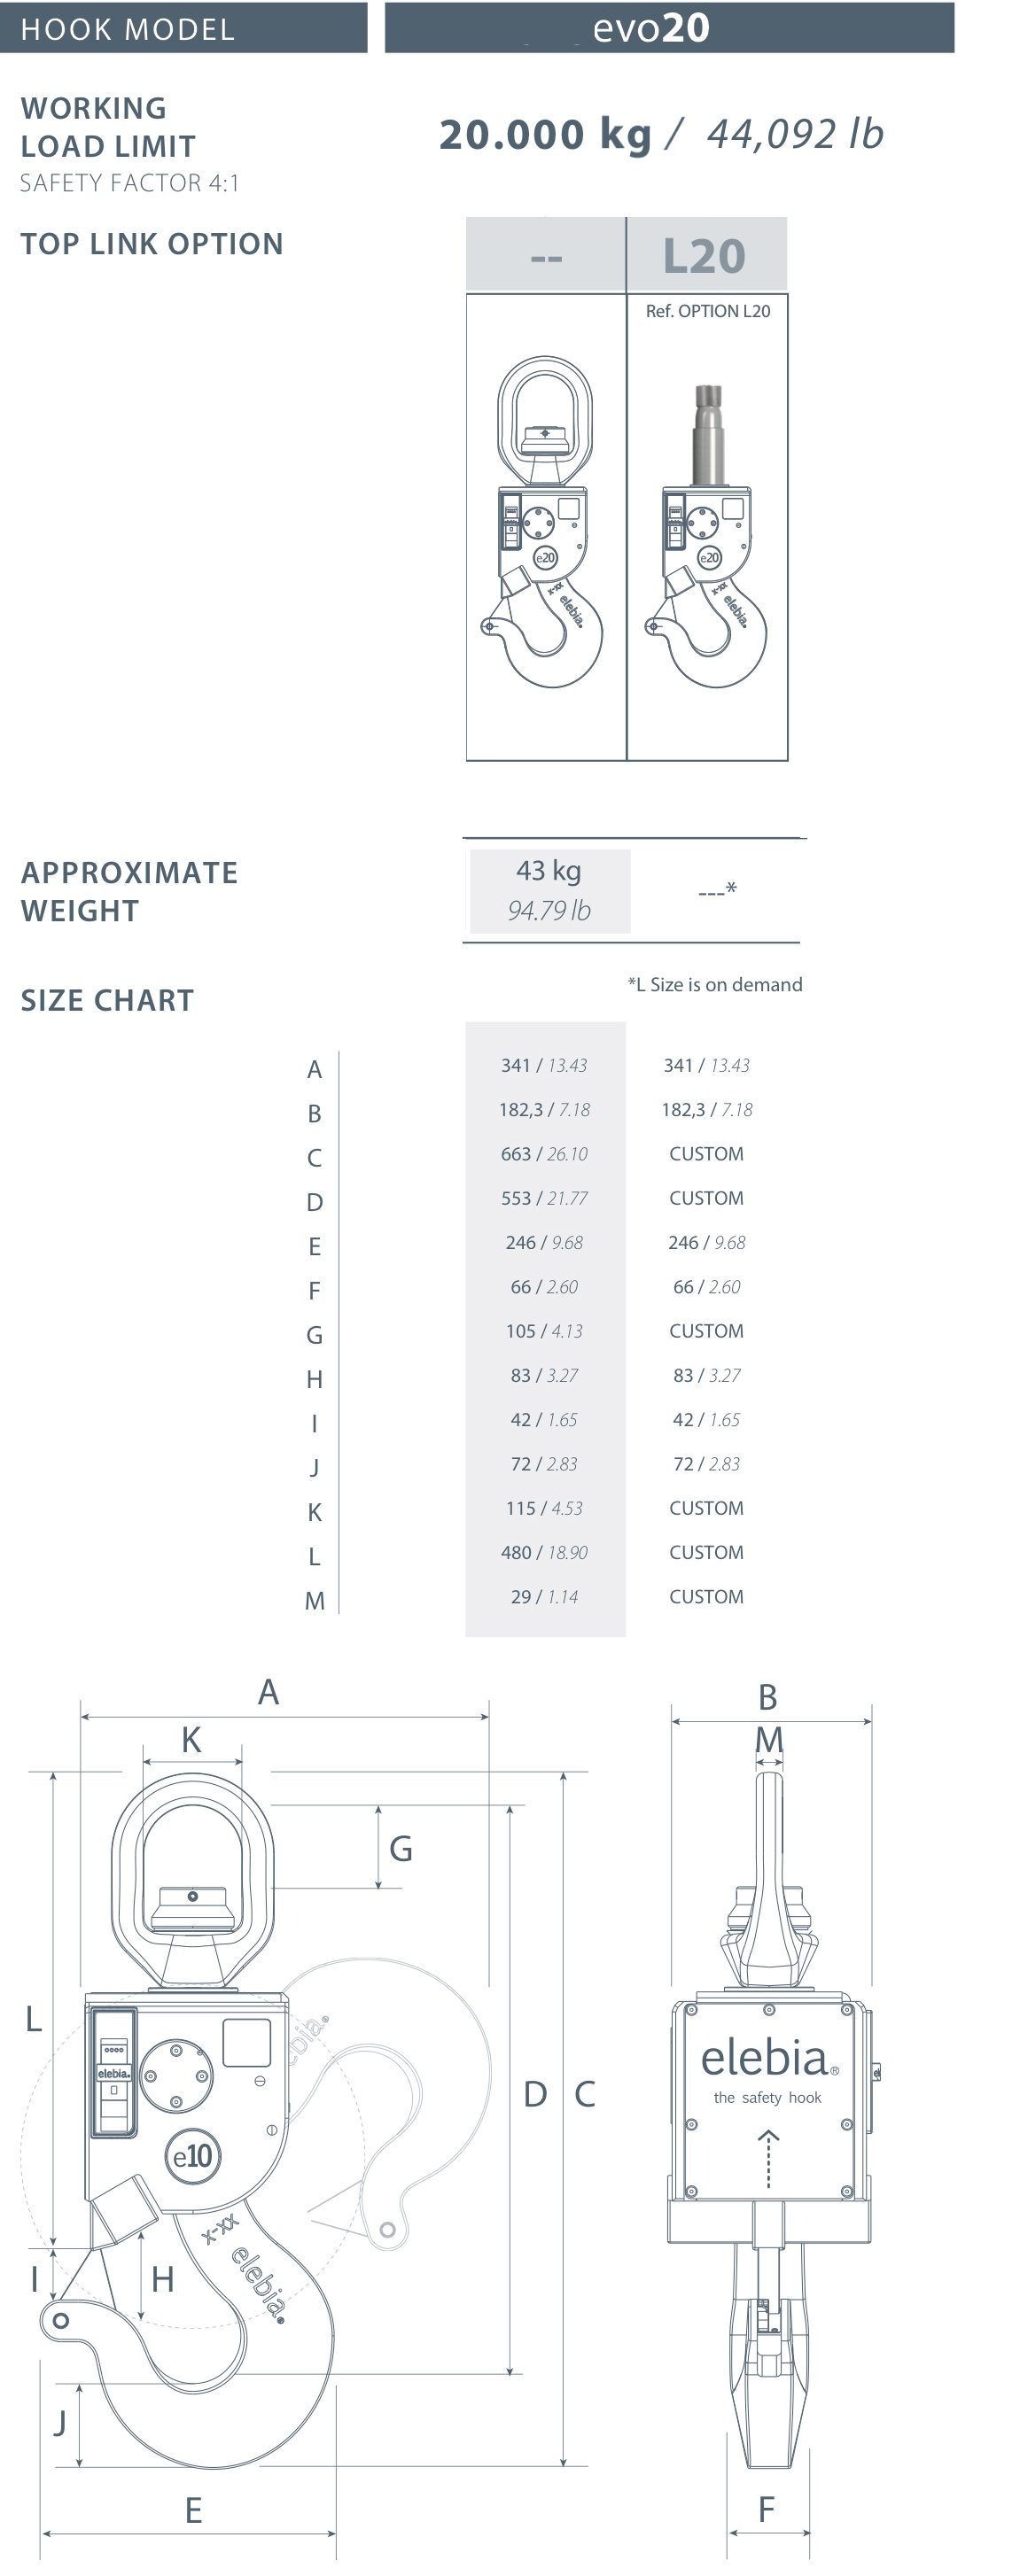 evo20 automatic hook specs - 自动吊钩的未来